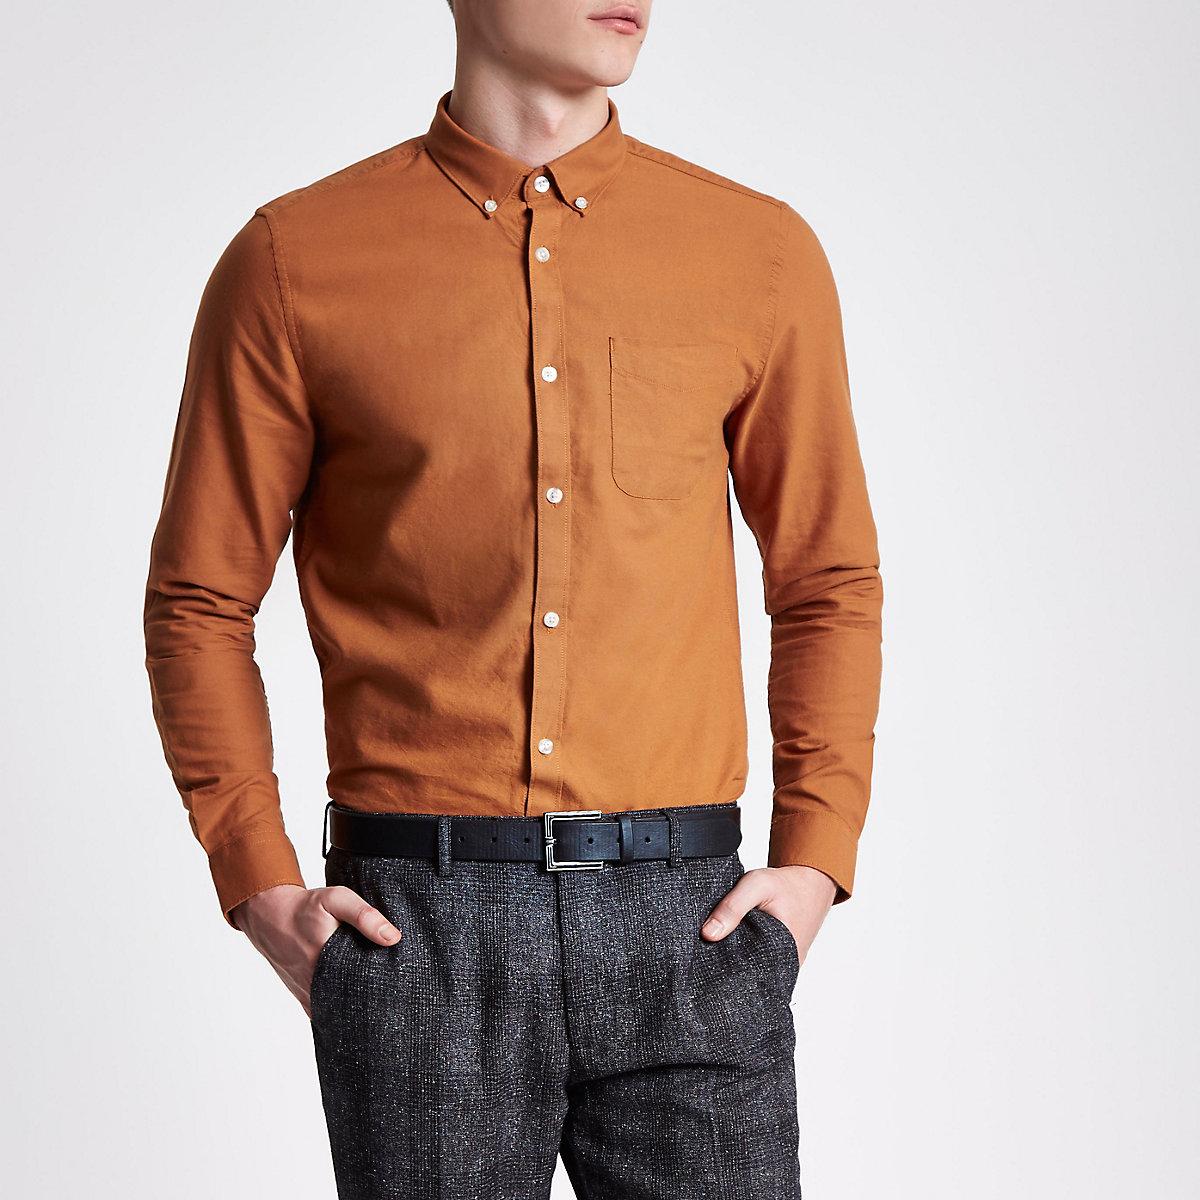 Rust orange long sleeve Oxford shirt